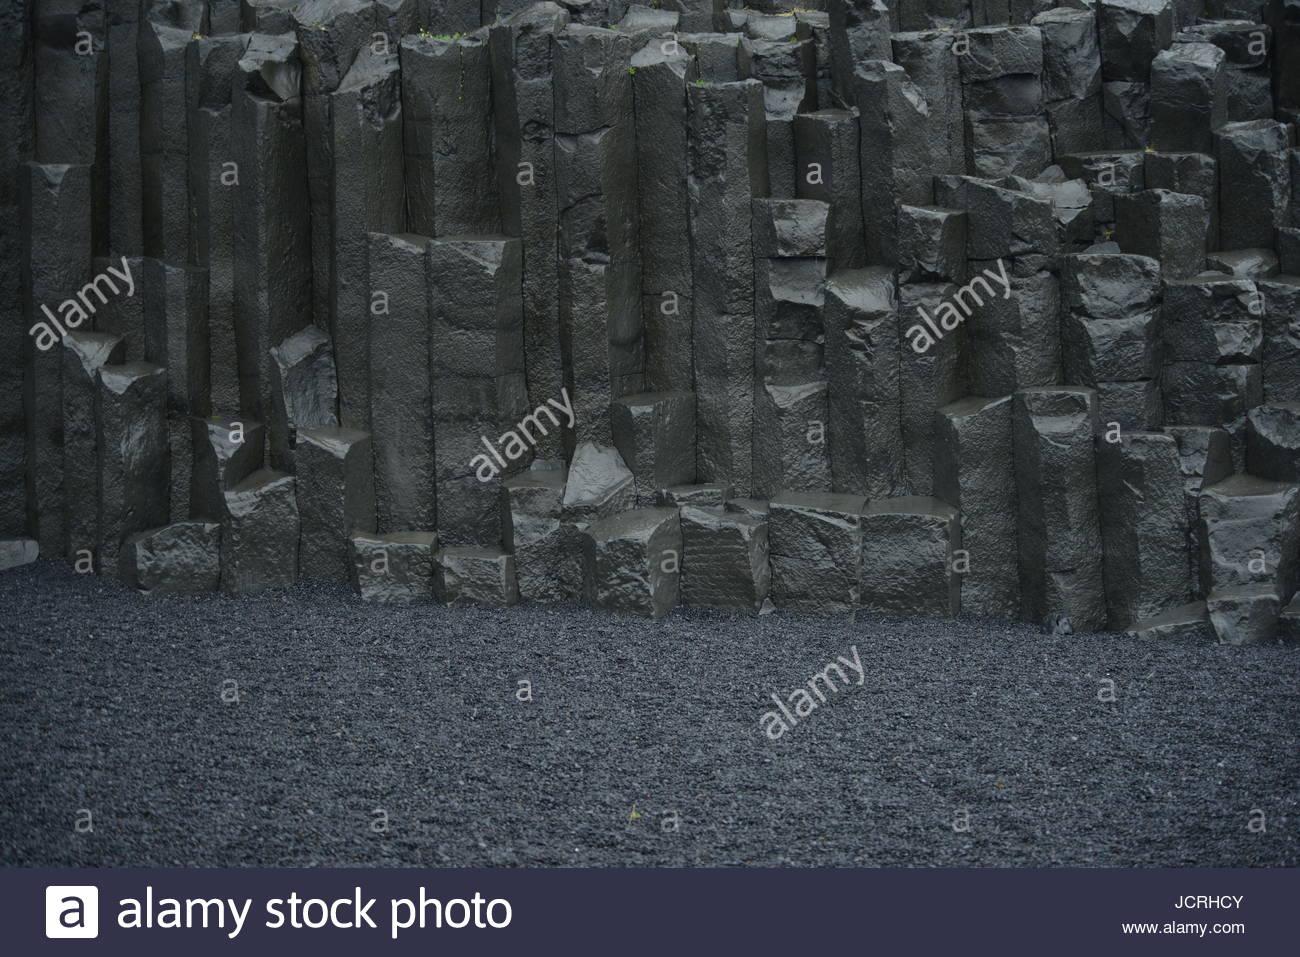 Basaltic Pillars in Iceland. - Stock Image